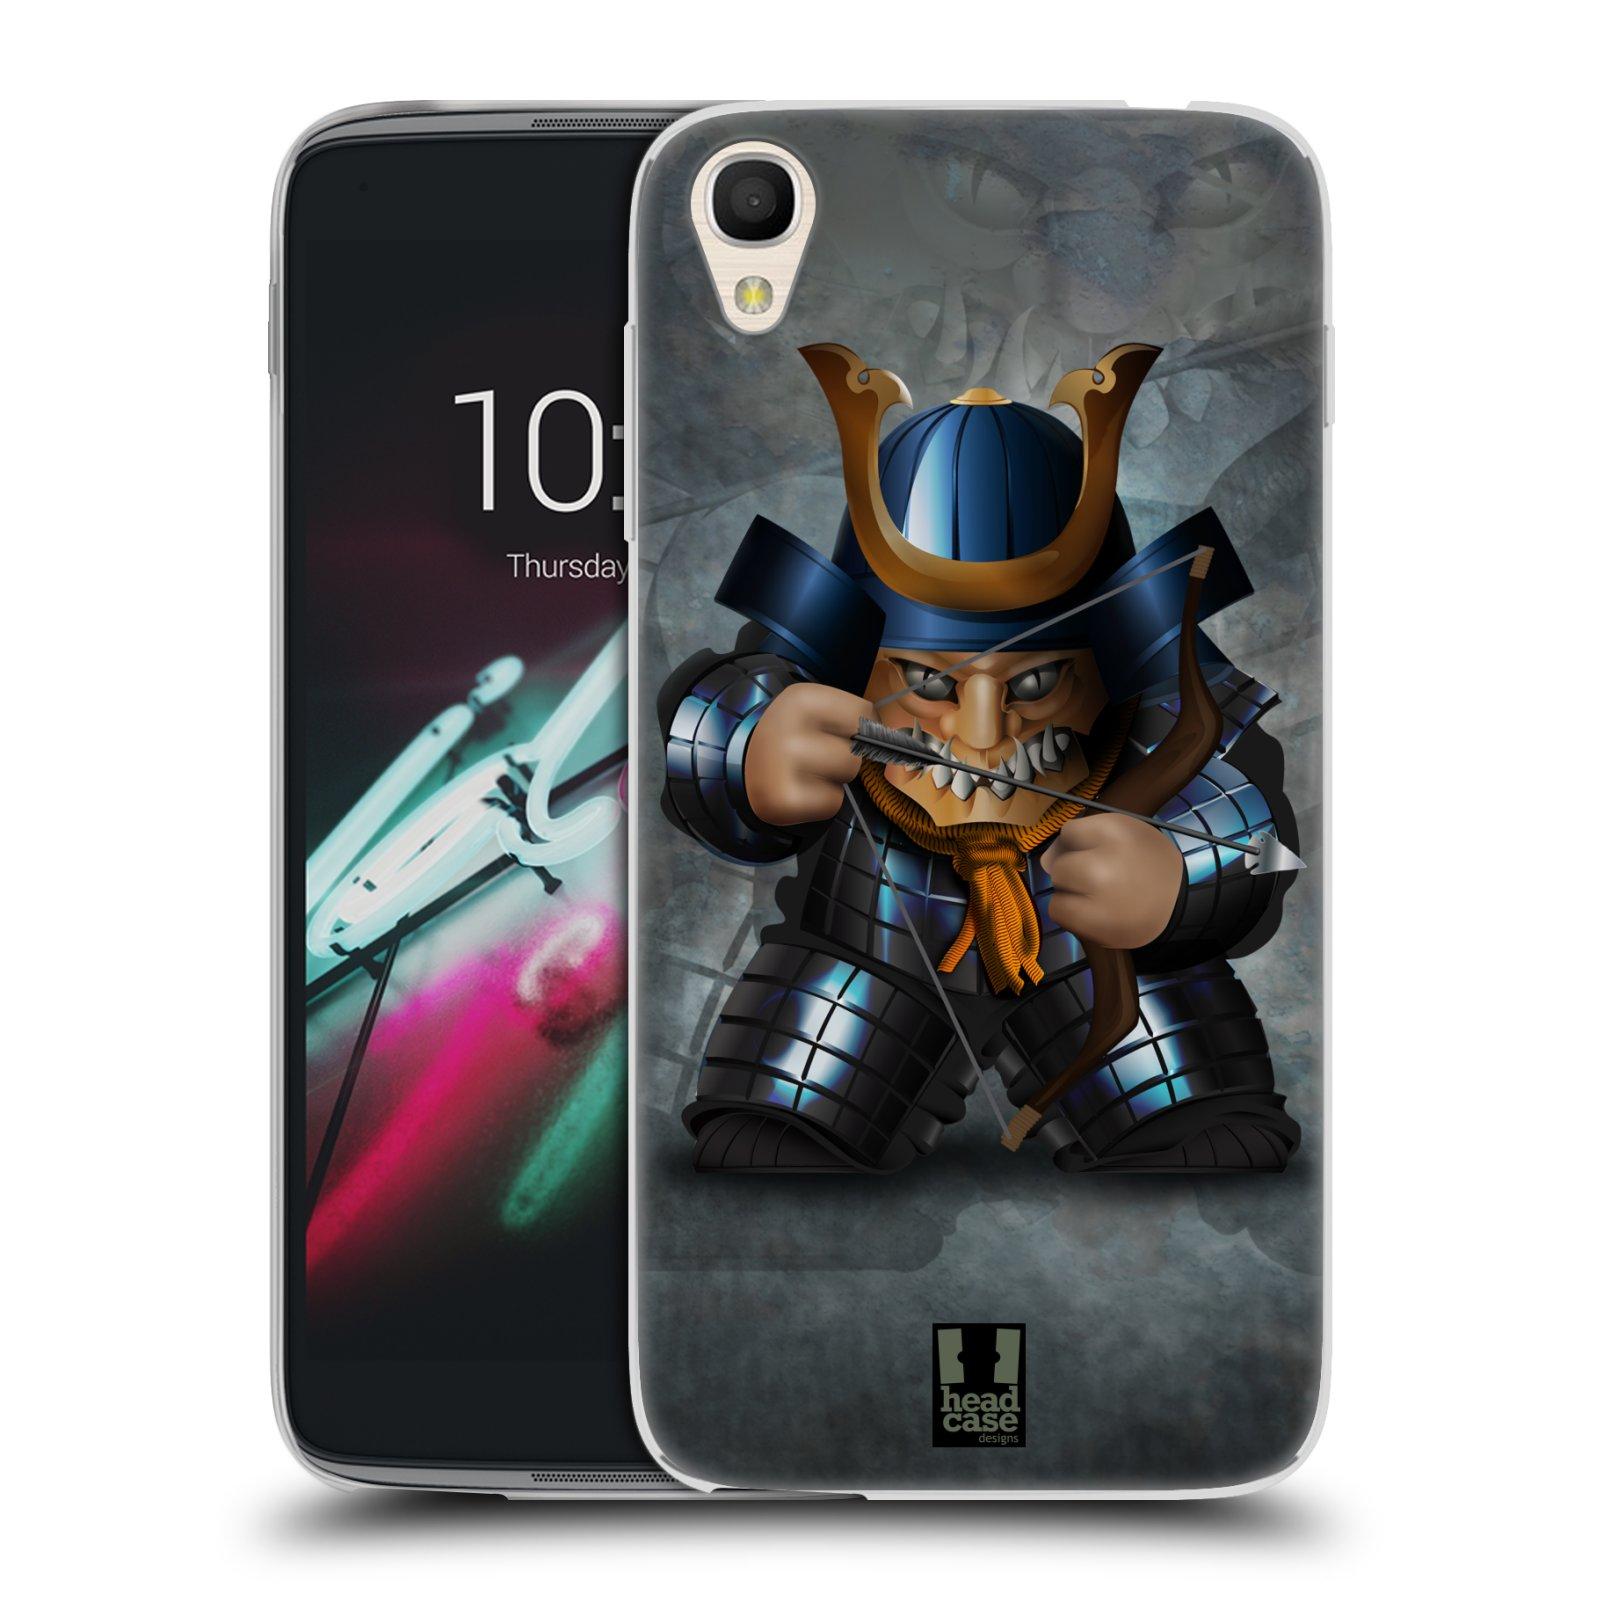 HEAD CASE silikonový obal na mobil Alcatel Idol 3 OT-6039Y (4.7) vzor Malí bojovníci SHOGUN STŘELEC